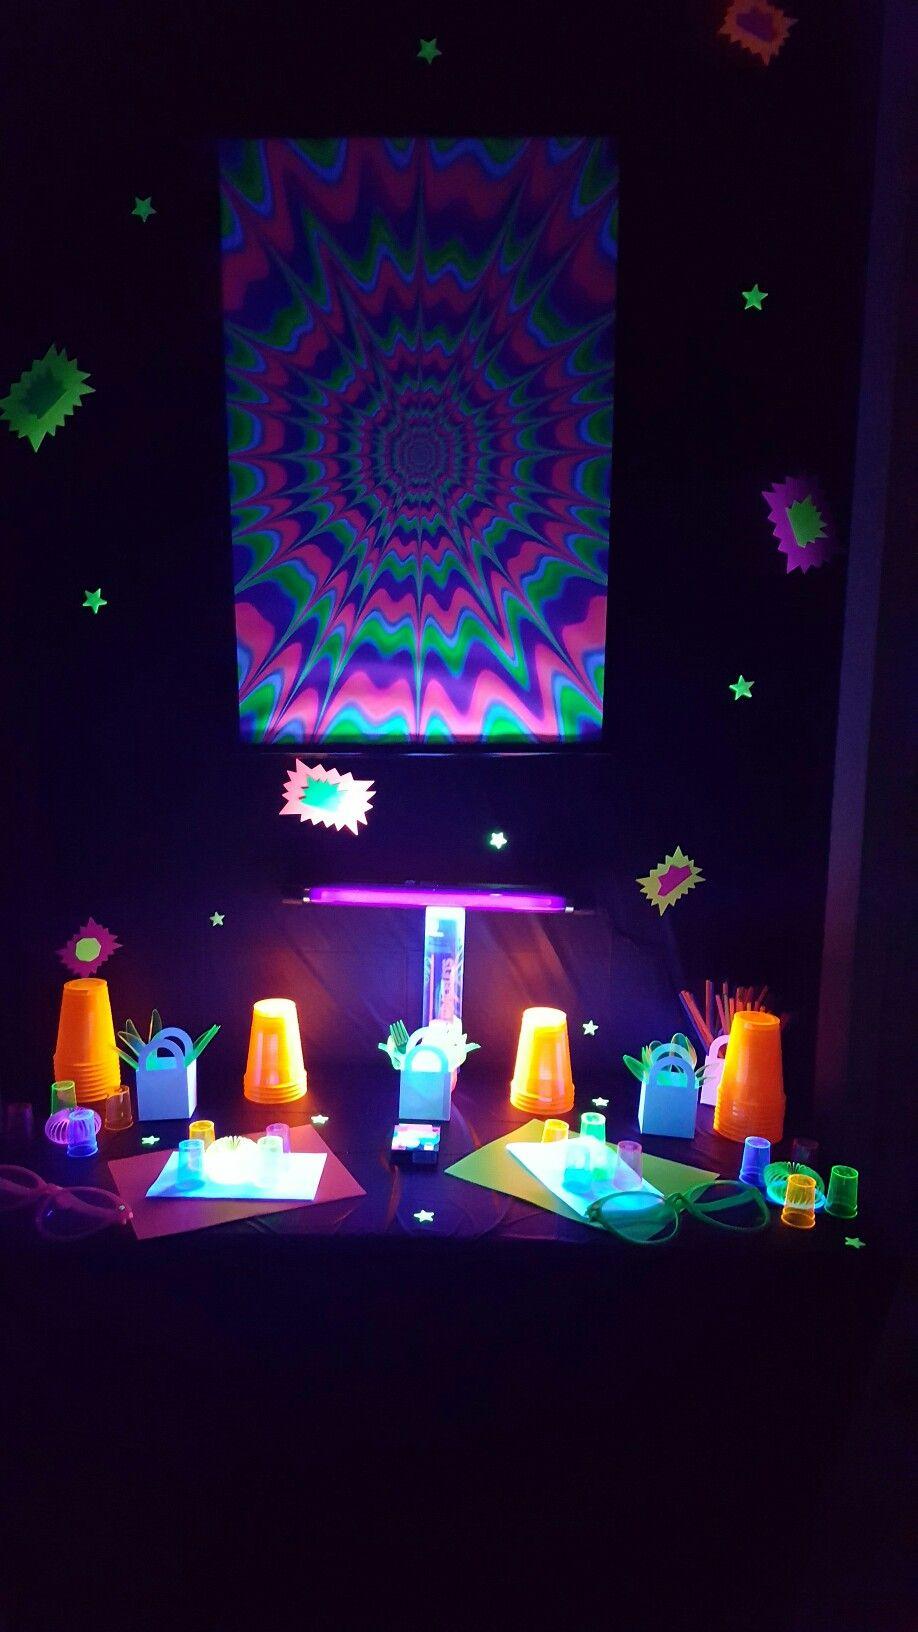 Diy Glow In The Dark Decoration Dollar Tree Style Diy Glow Party Decorations Glow In The Dark